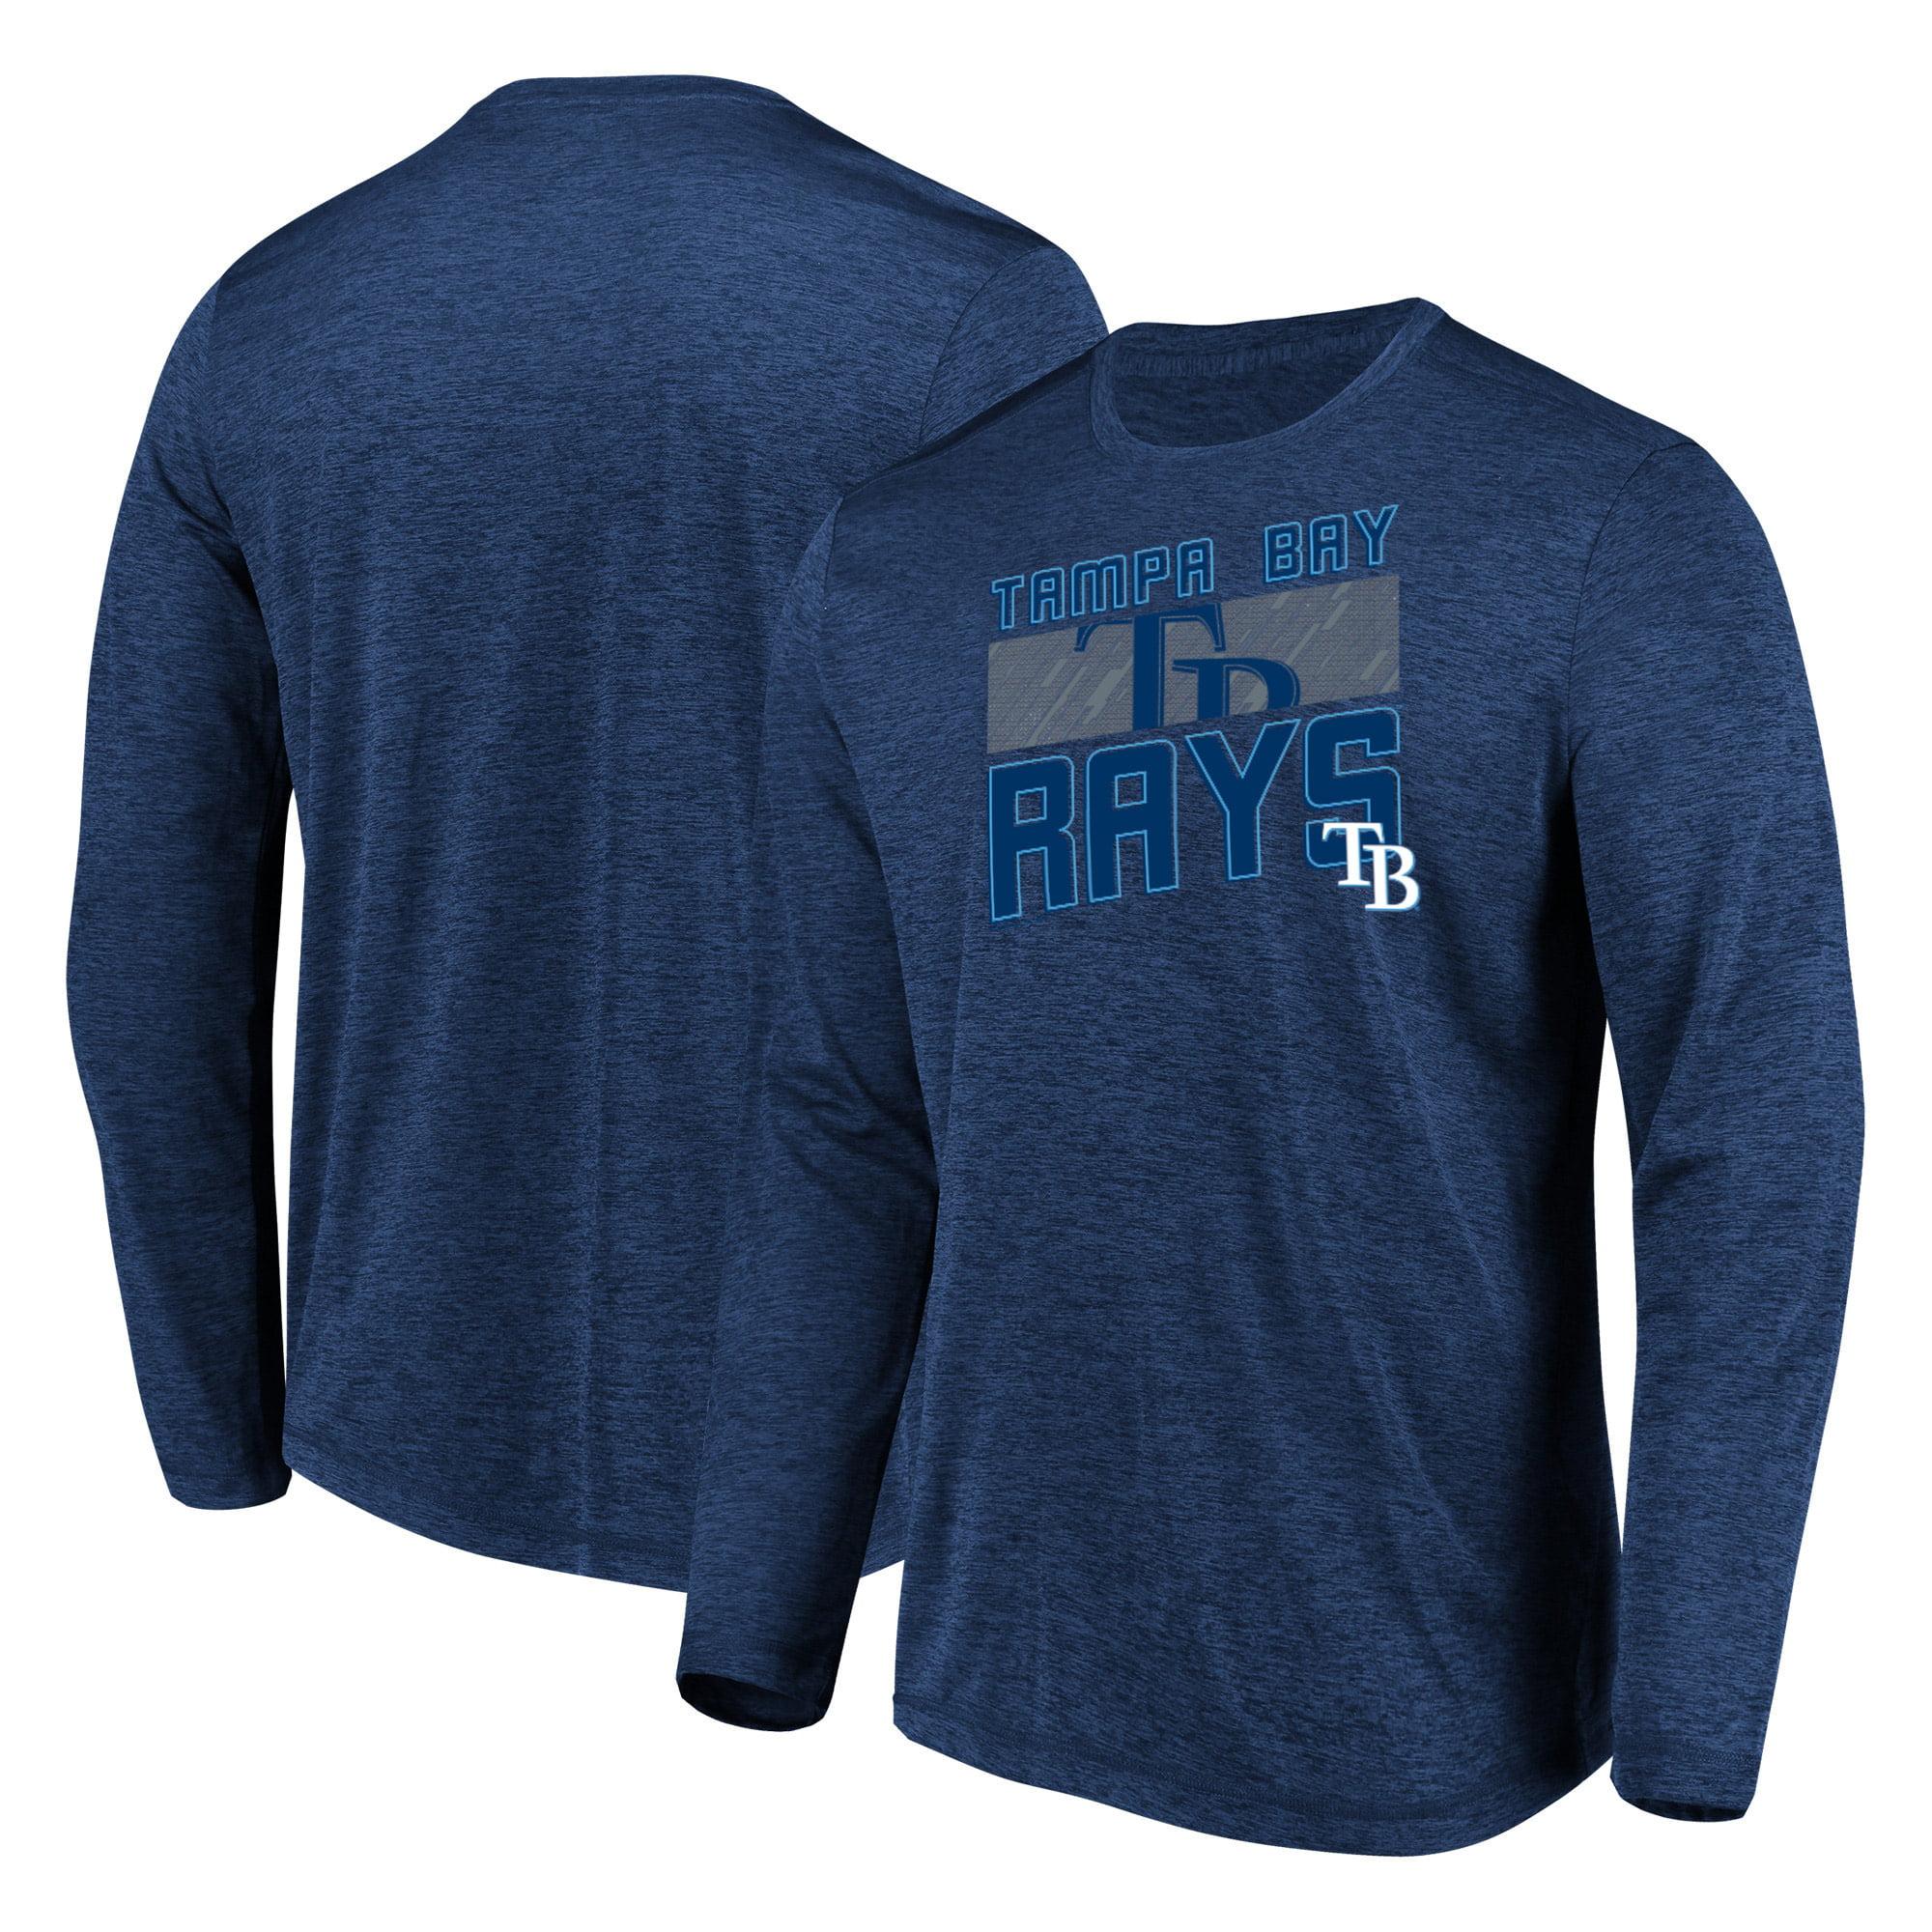 Men's Majestic Heathered Navy Tampa Bay Rays Big & Tall Long Sleeve Team T-Shirt